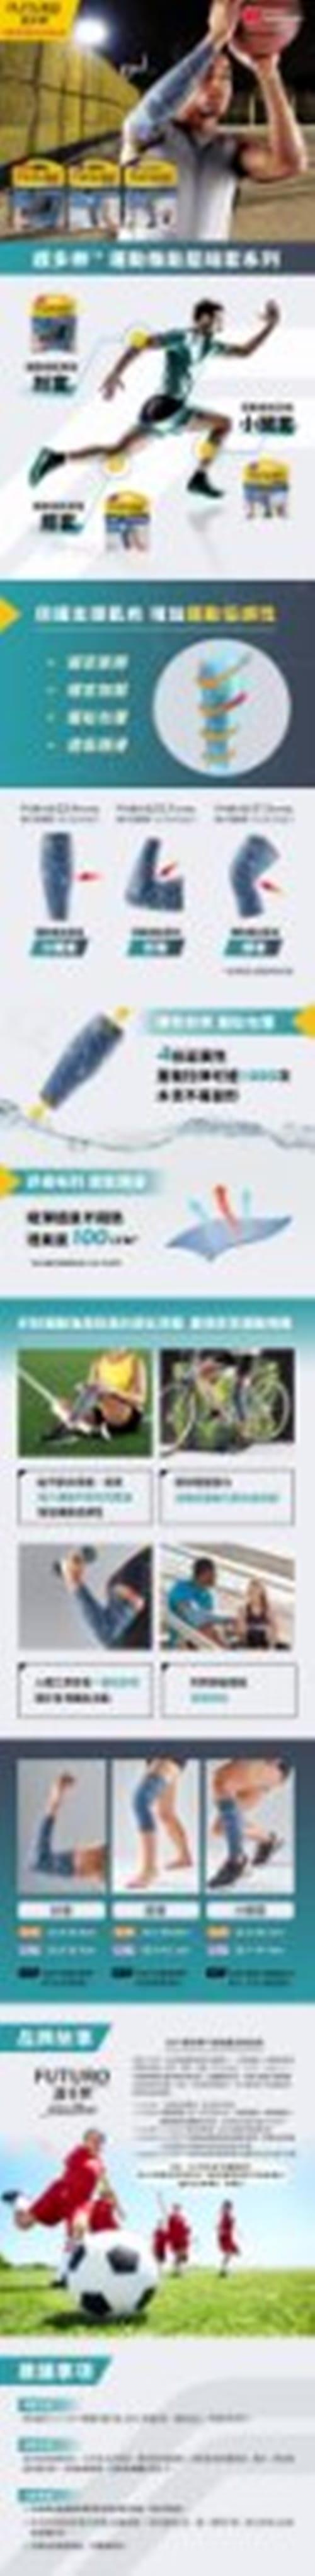 3M FUTURO運動機能壓縮小腿套單車 路跑 馬拉松 1